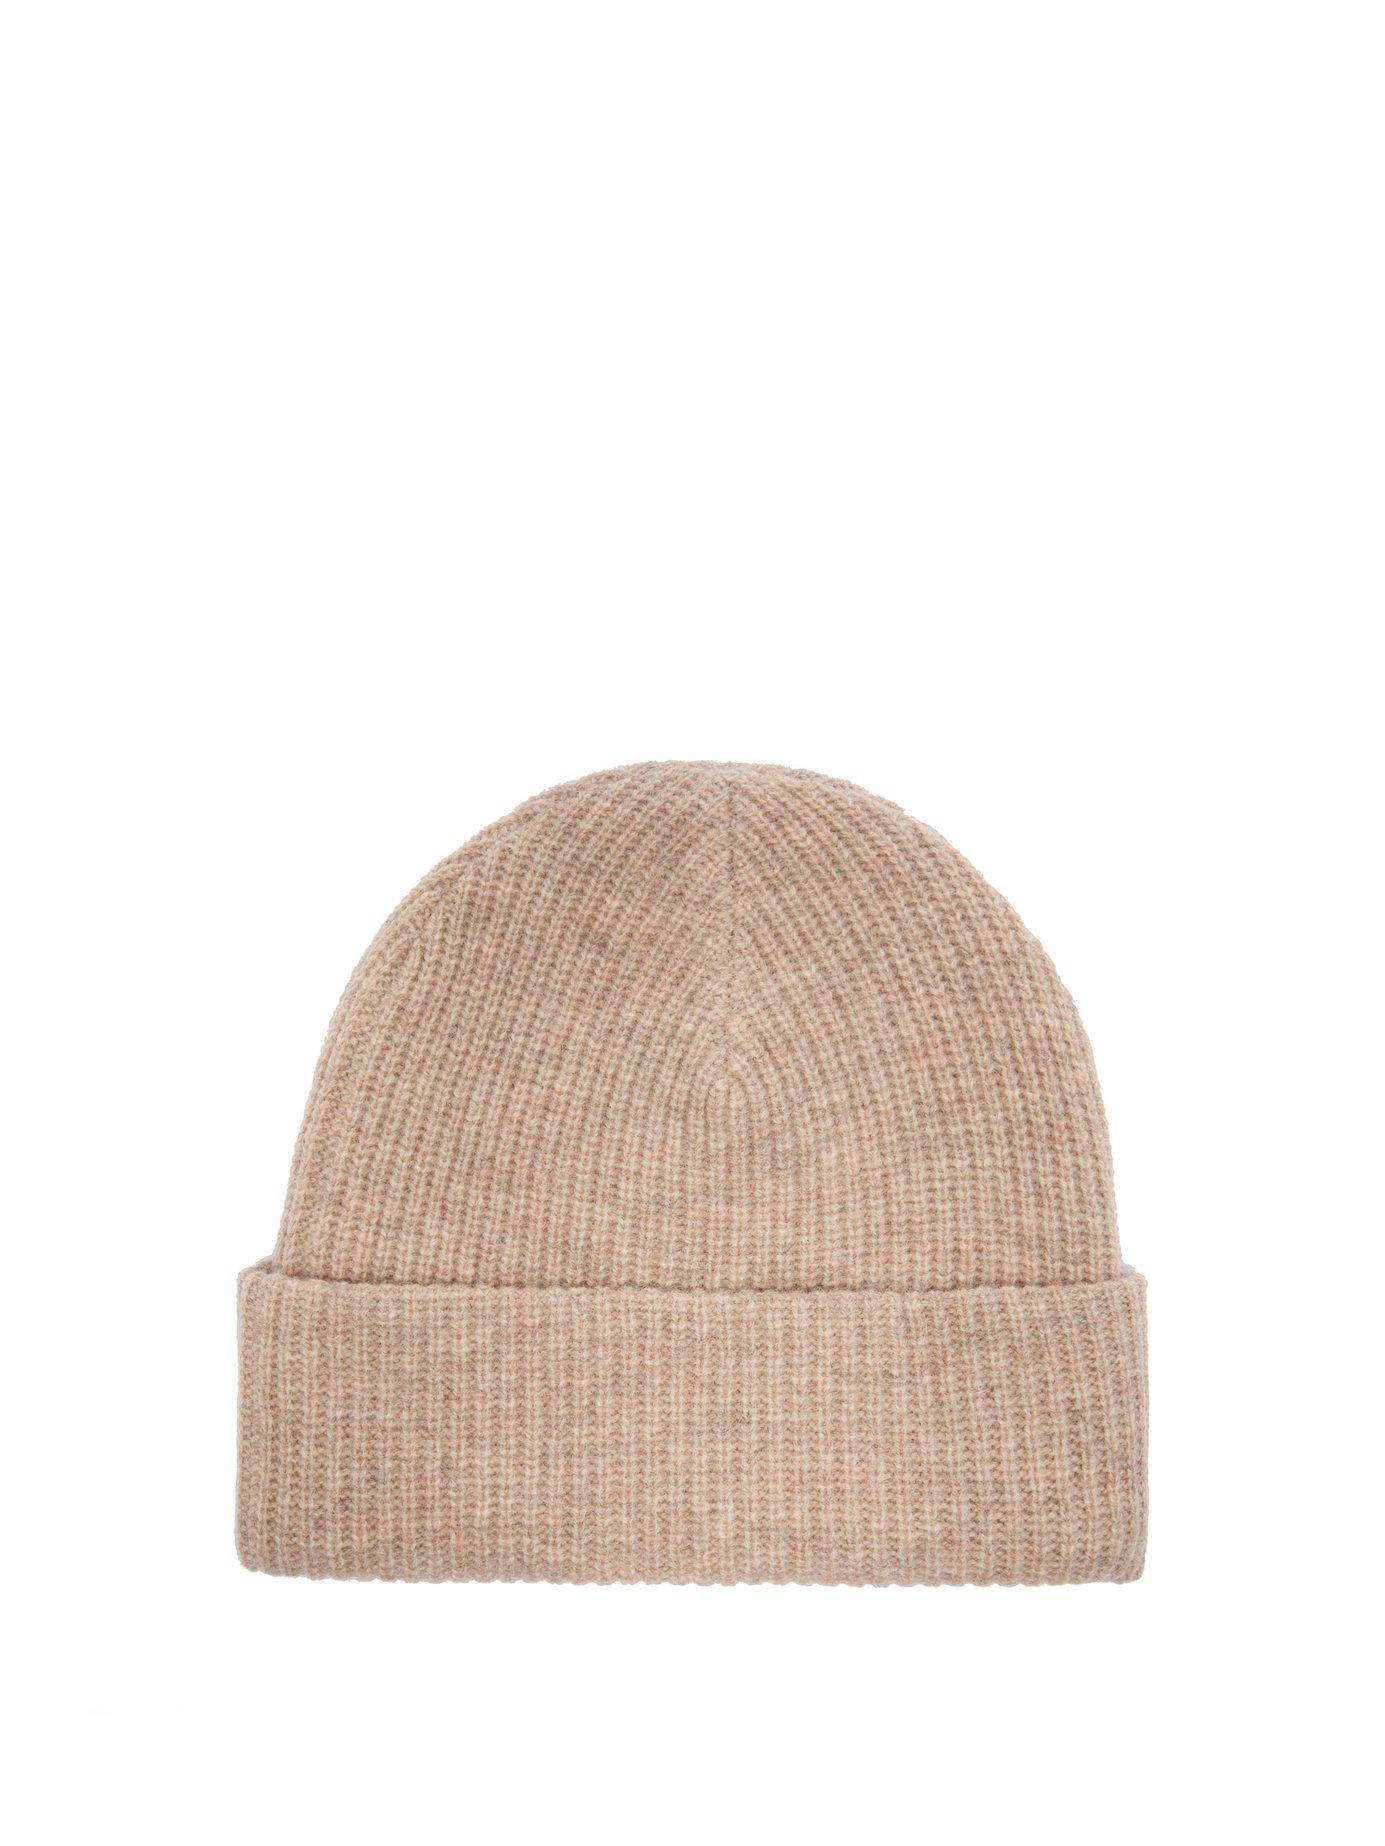 Lyst - Ganni Hatley Wool Blend Beanie Hat in Natural cc7ec782e3b7